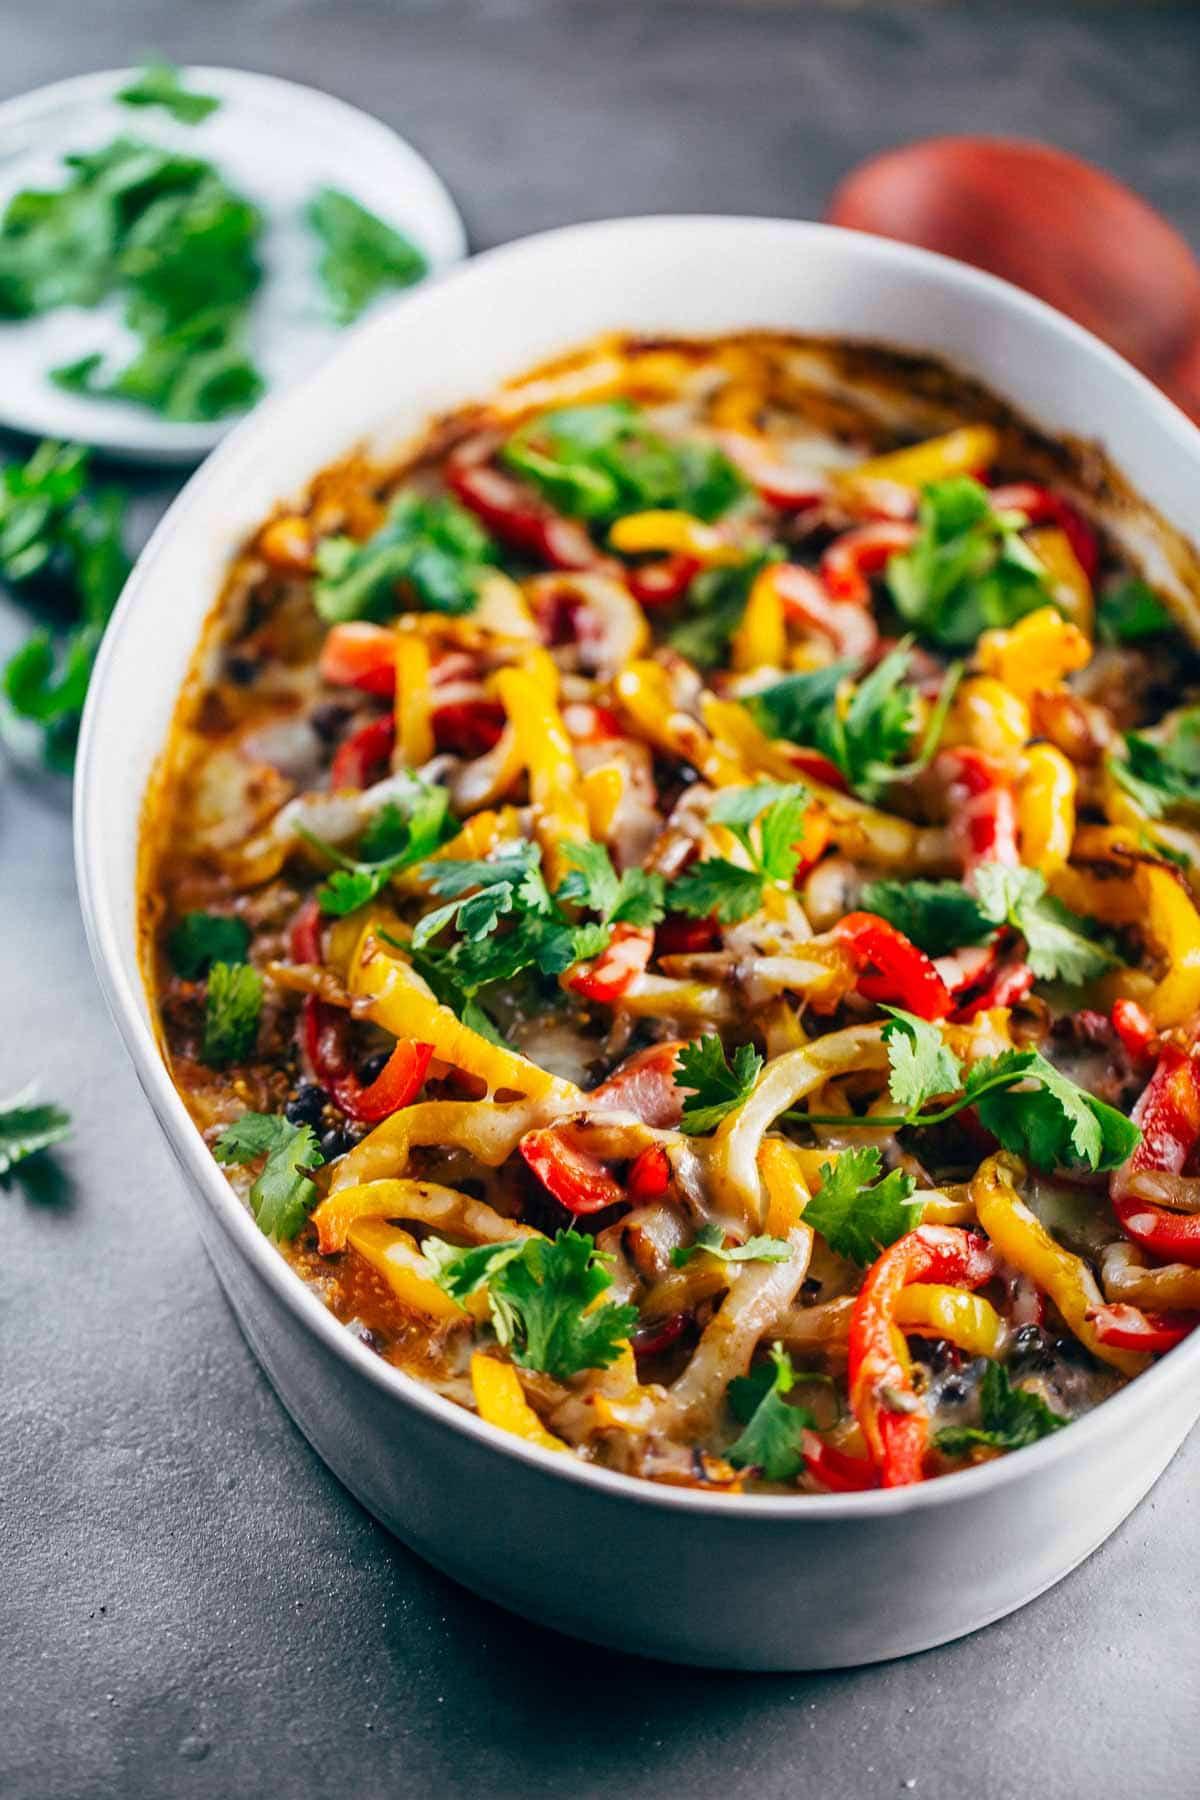 Healthy Chicken Casserole Dishes  Easy Mexican Chicken Quinoa Casserole Recipe Pinch of Yum